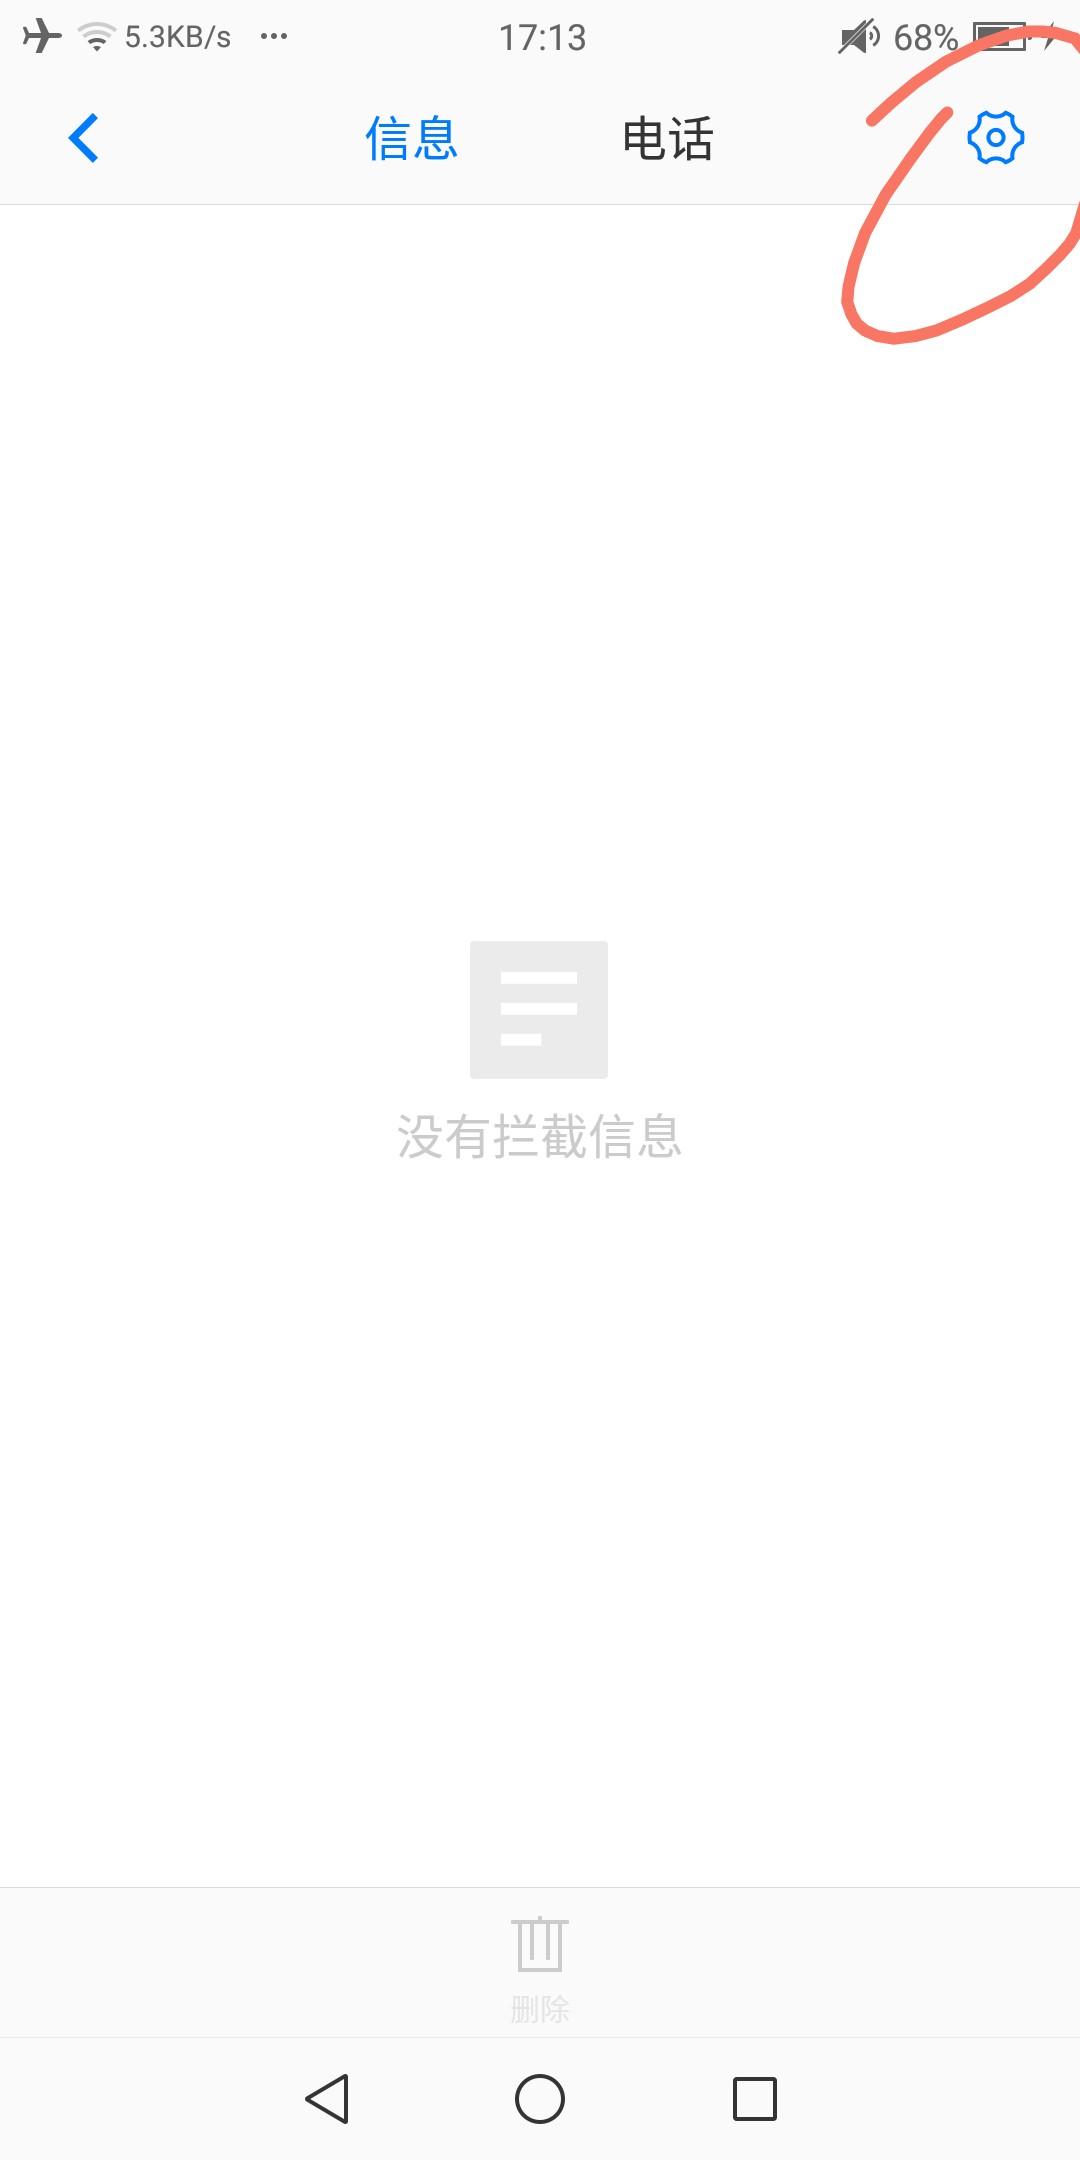 rBAAdmByvkOAcjb4AADKOBwp5s0333.jpg插图(4)